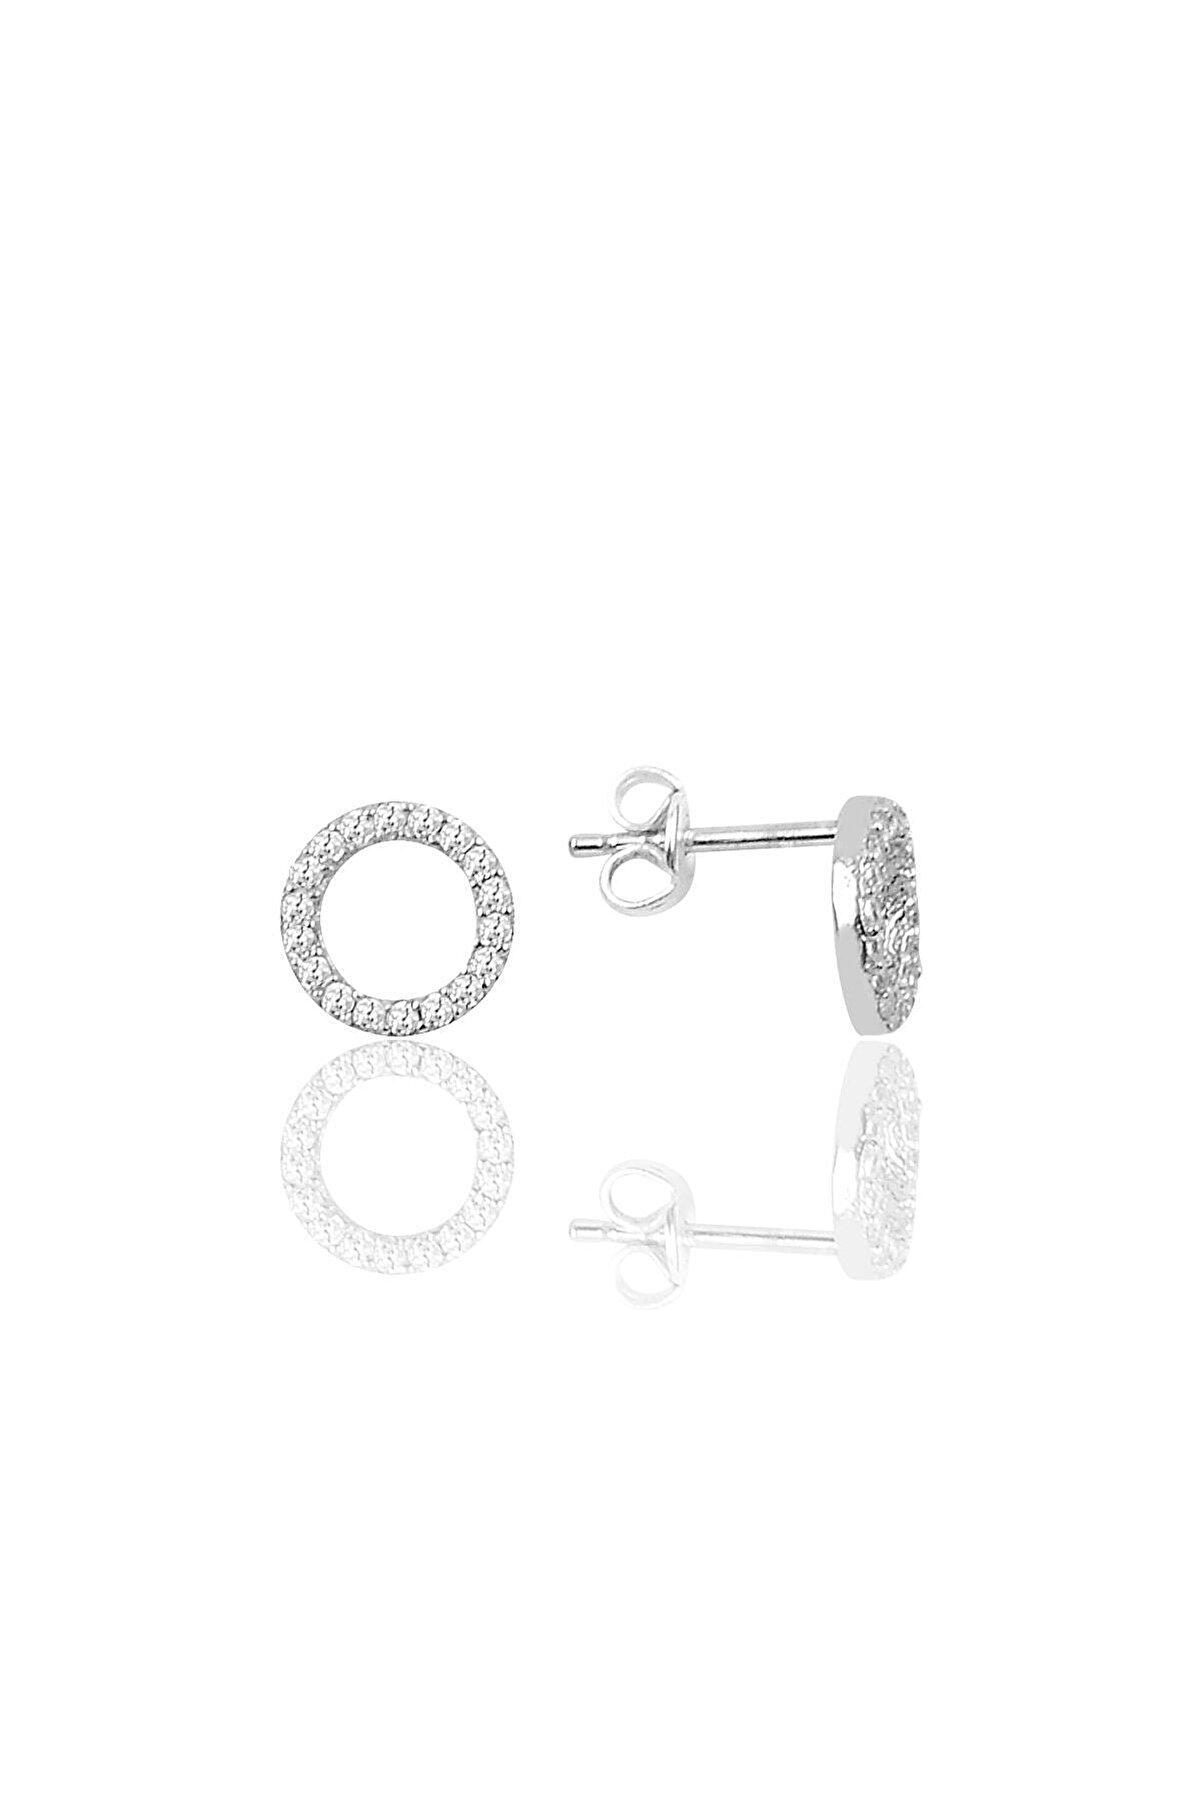 Söğütlü Silver Gümüş Zirkon Taşlı Halka Modeli Küpe